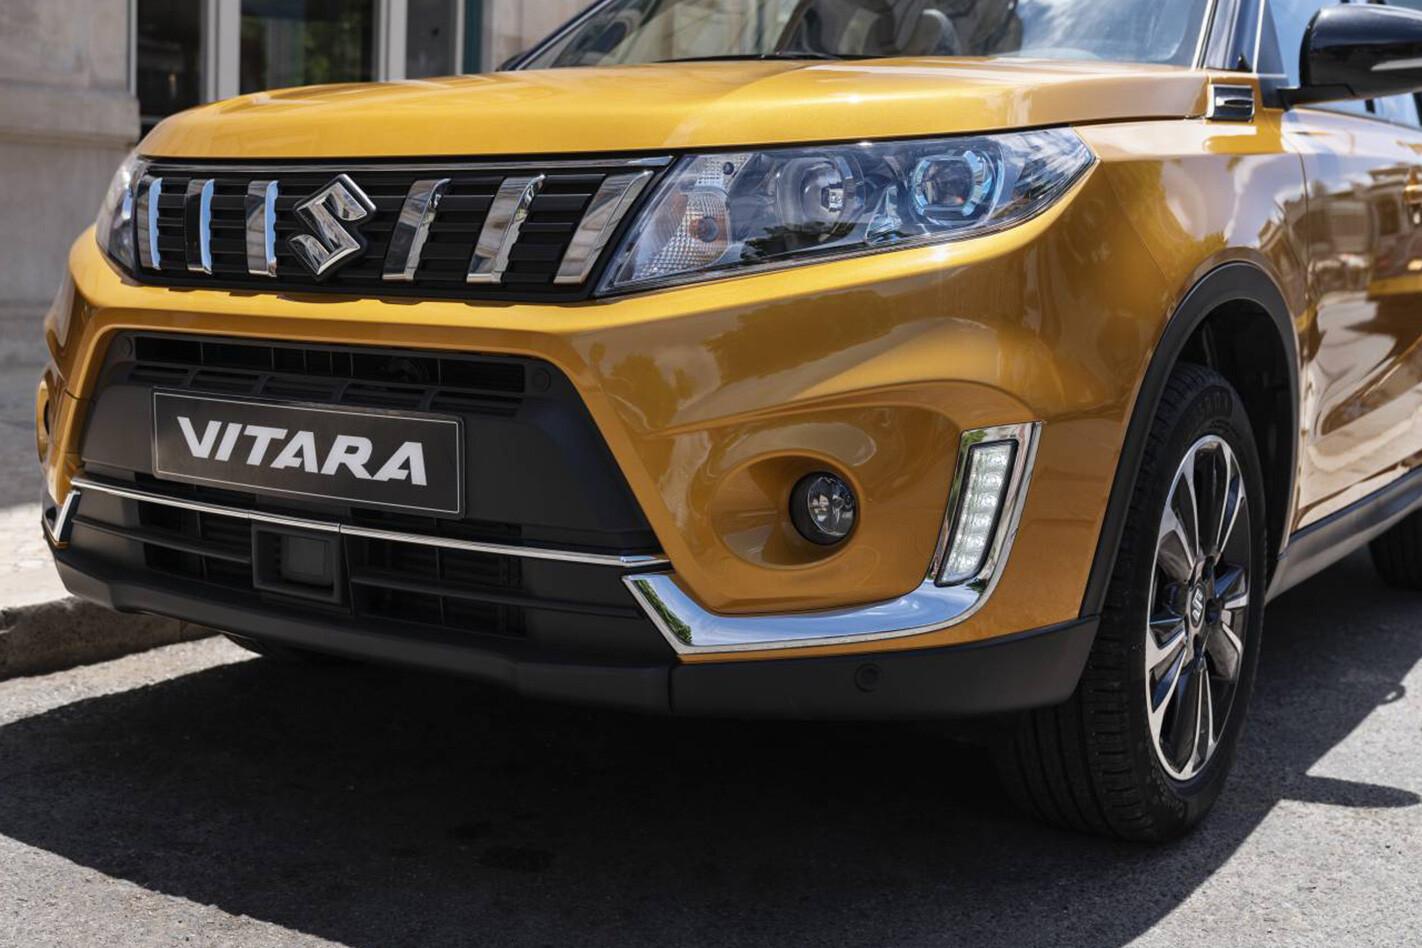 Suzuki Vitara Front 281 29 Jpg